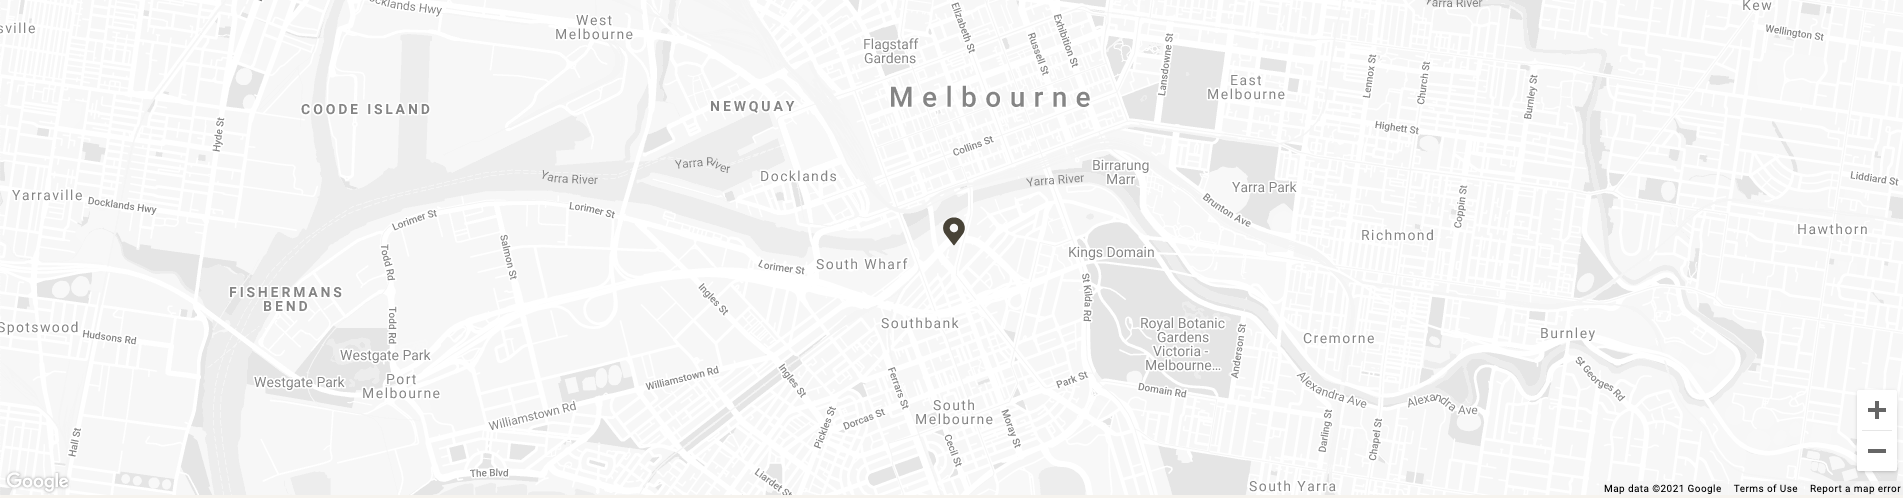 Map image of Crown Promenade Melbourne